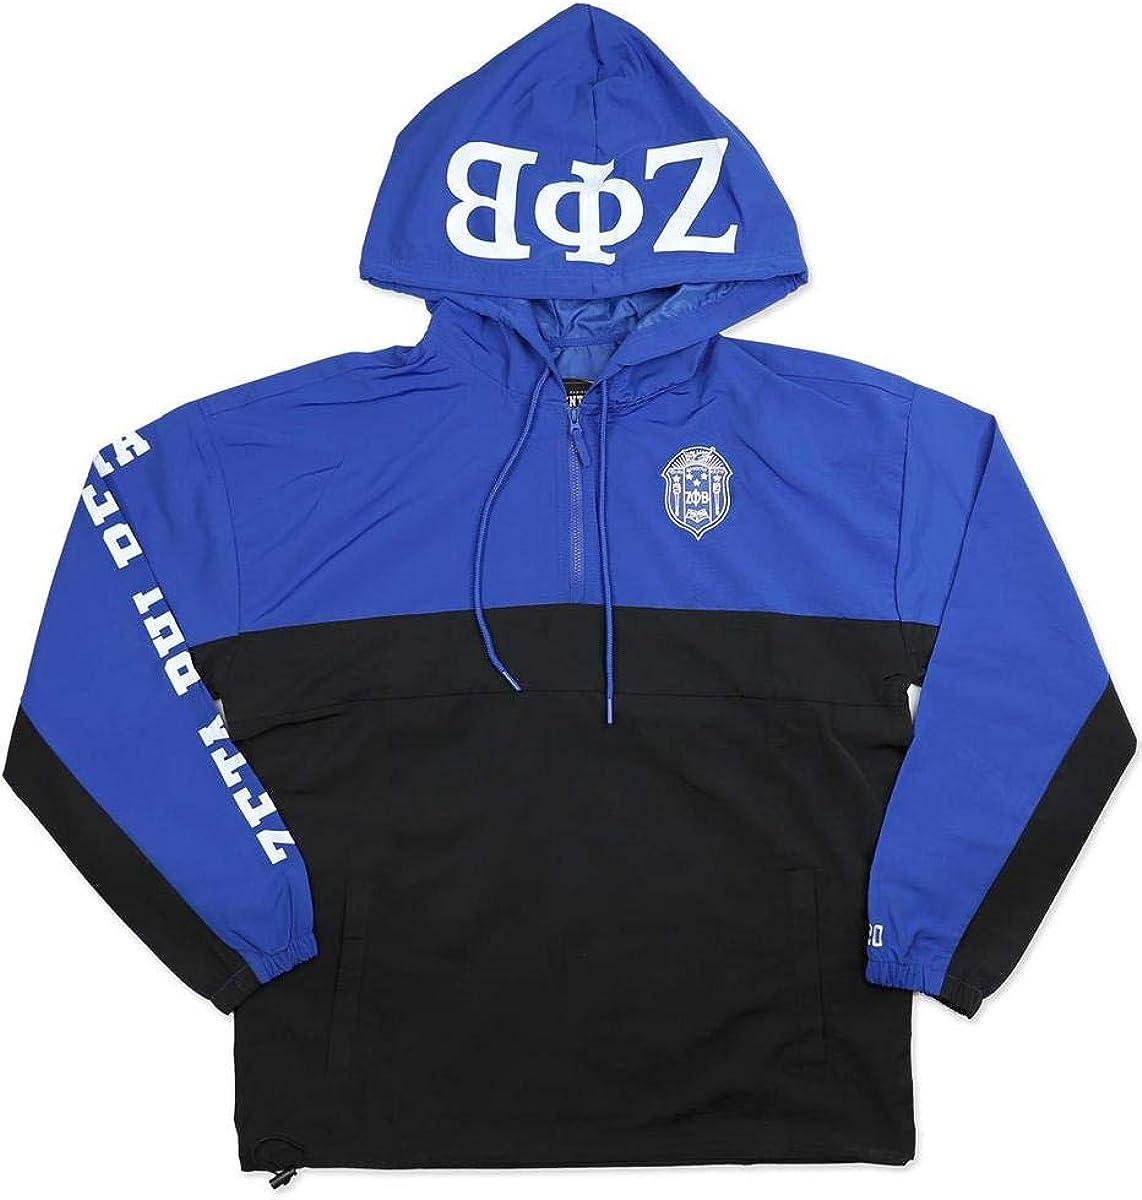 Zeta Phi Beta Sorority Waterproof Anorak Jacket